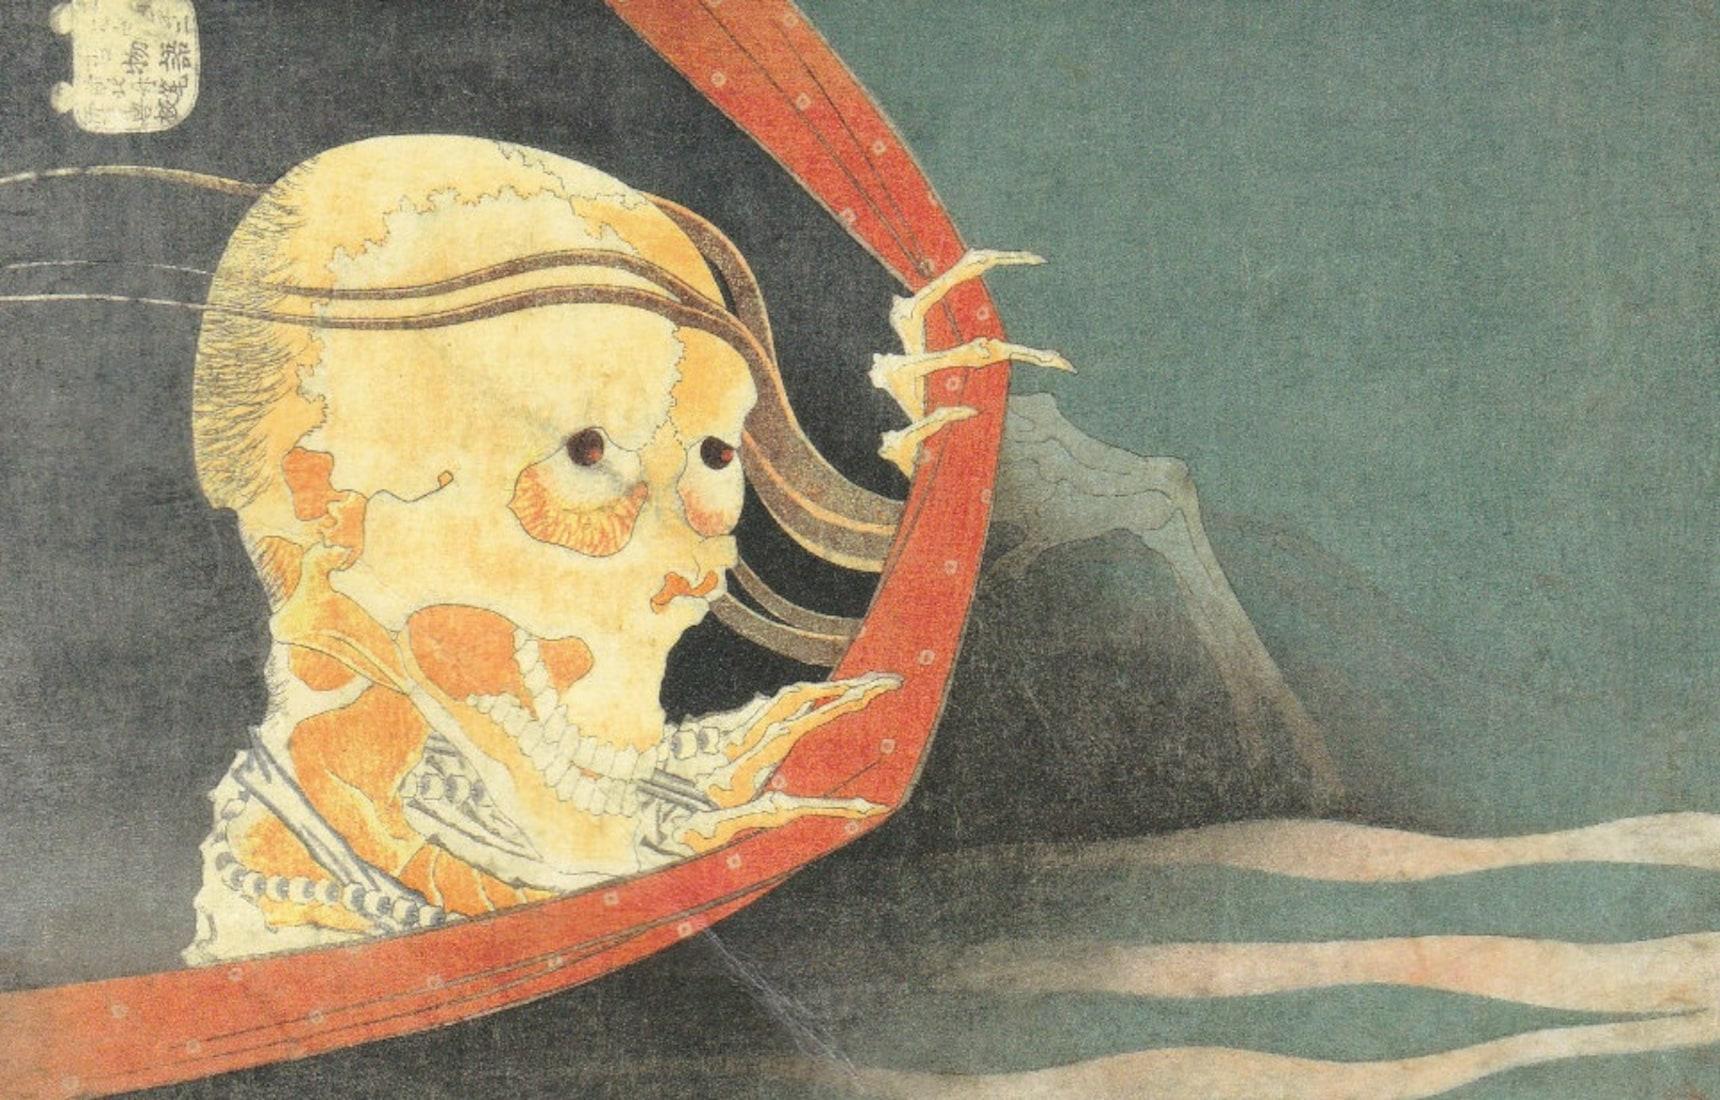 Obake in Japanese Popular Culture